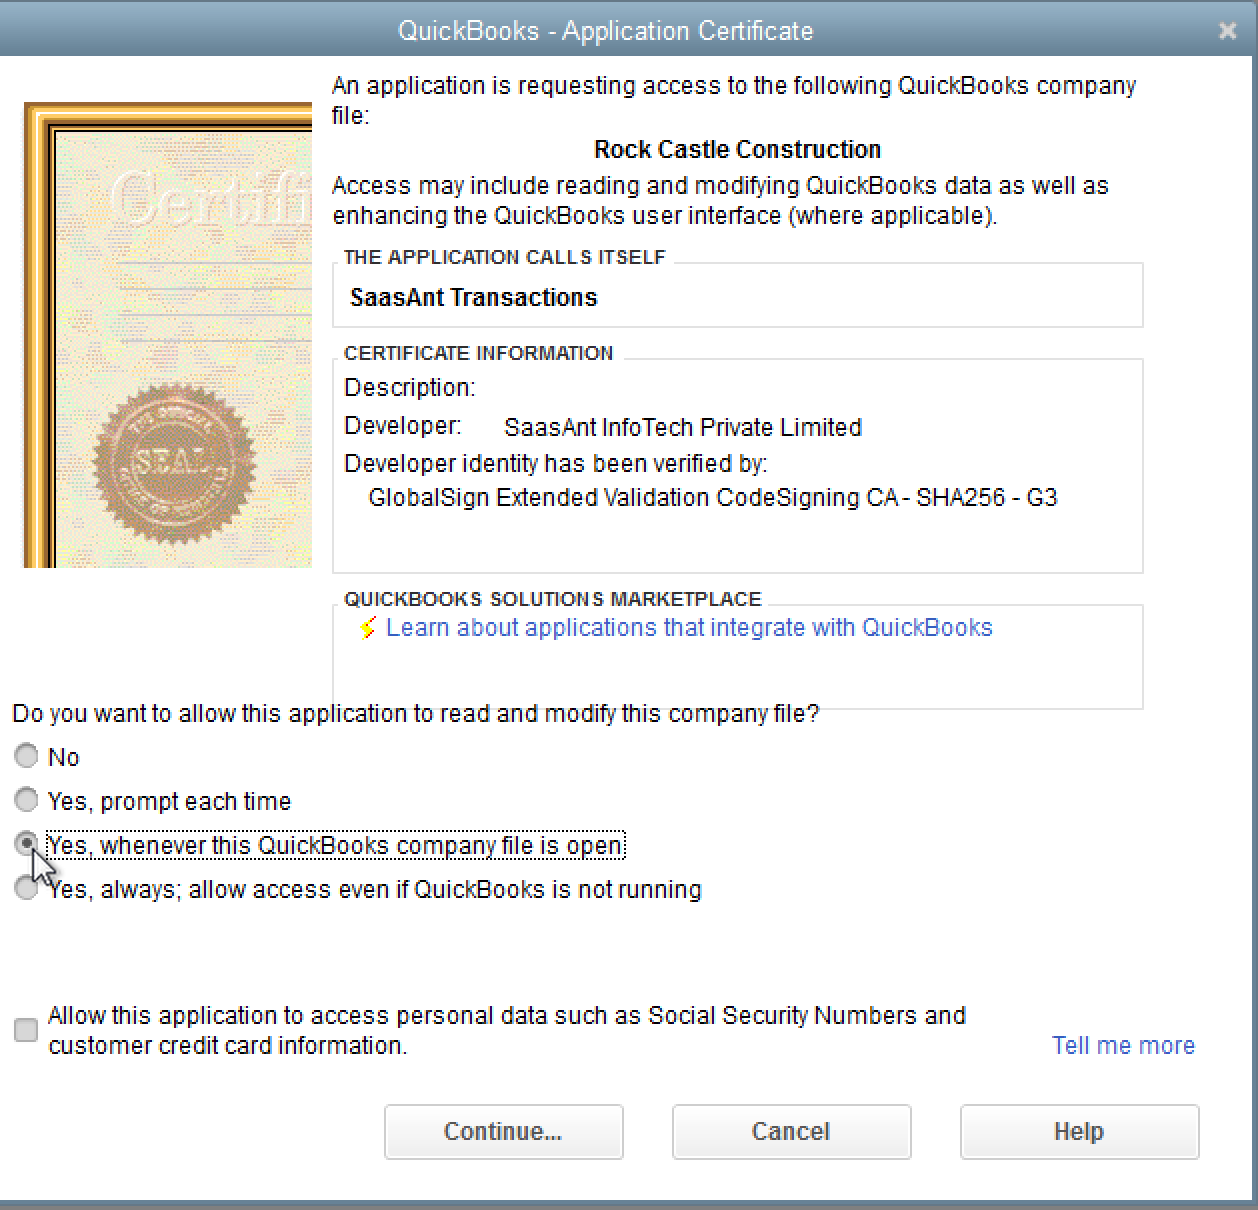 SaasAnt Transactions (Desktop) quickbooks certification